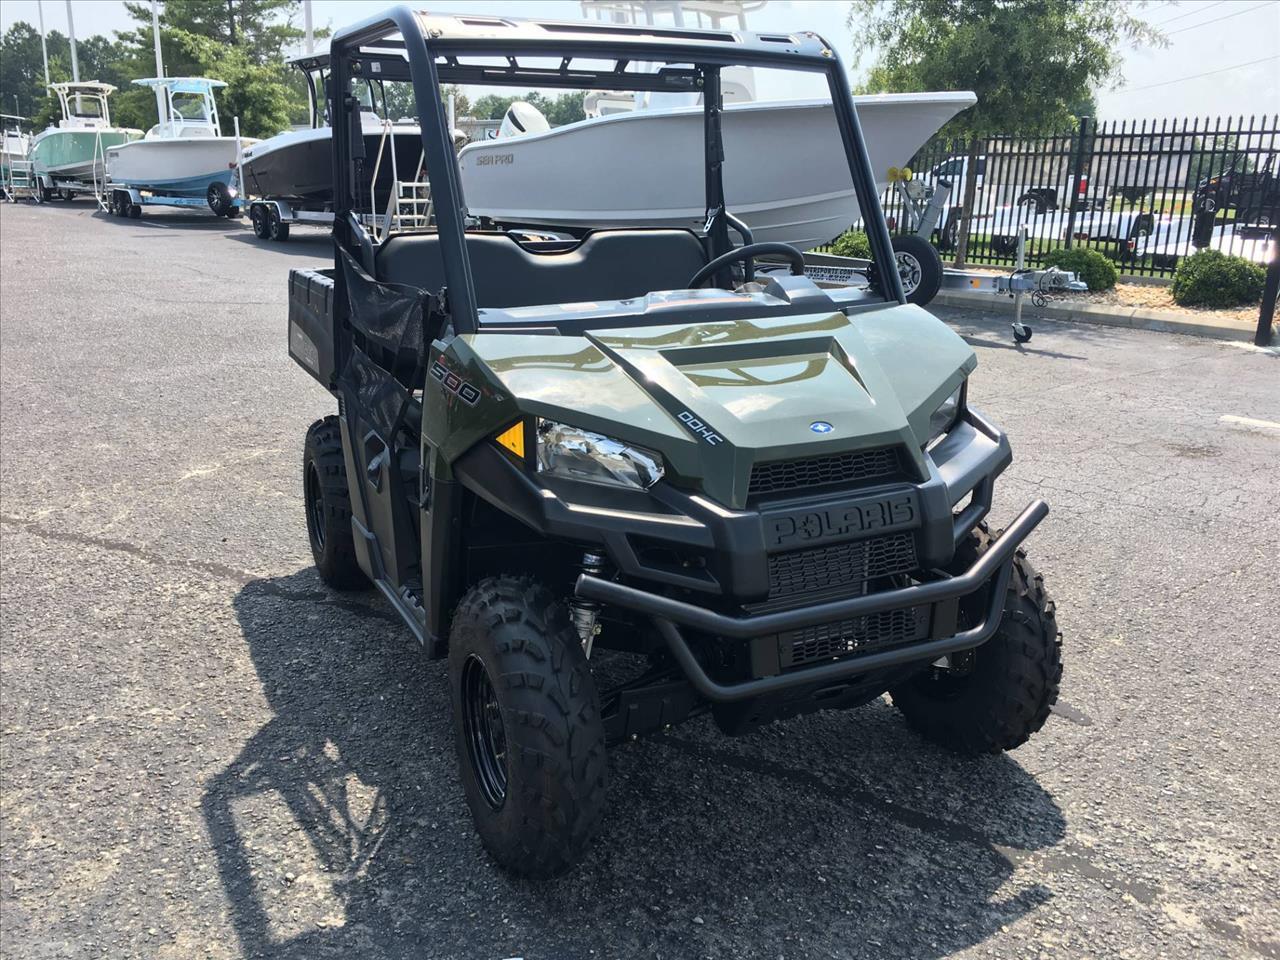 2017 Polaris Ranger 500 for sale at Vehicle Network, LLC - Performance East, INC. in Goldsboro NC